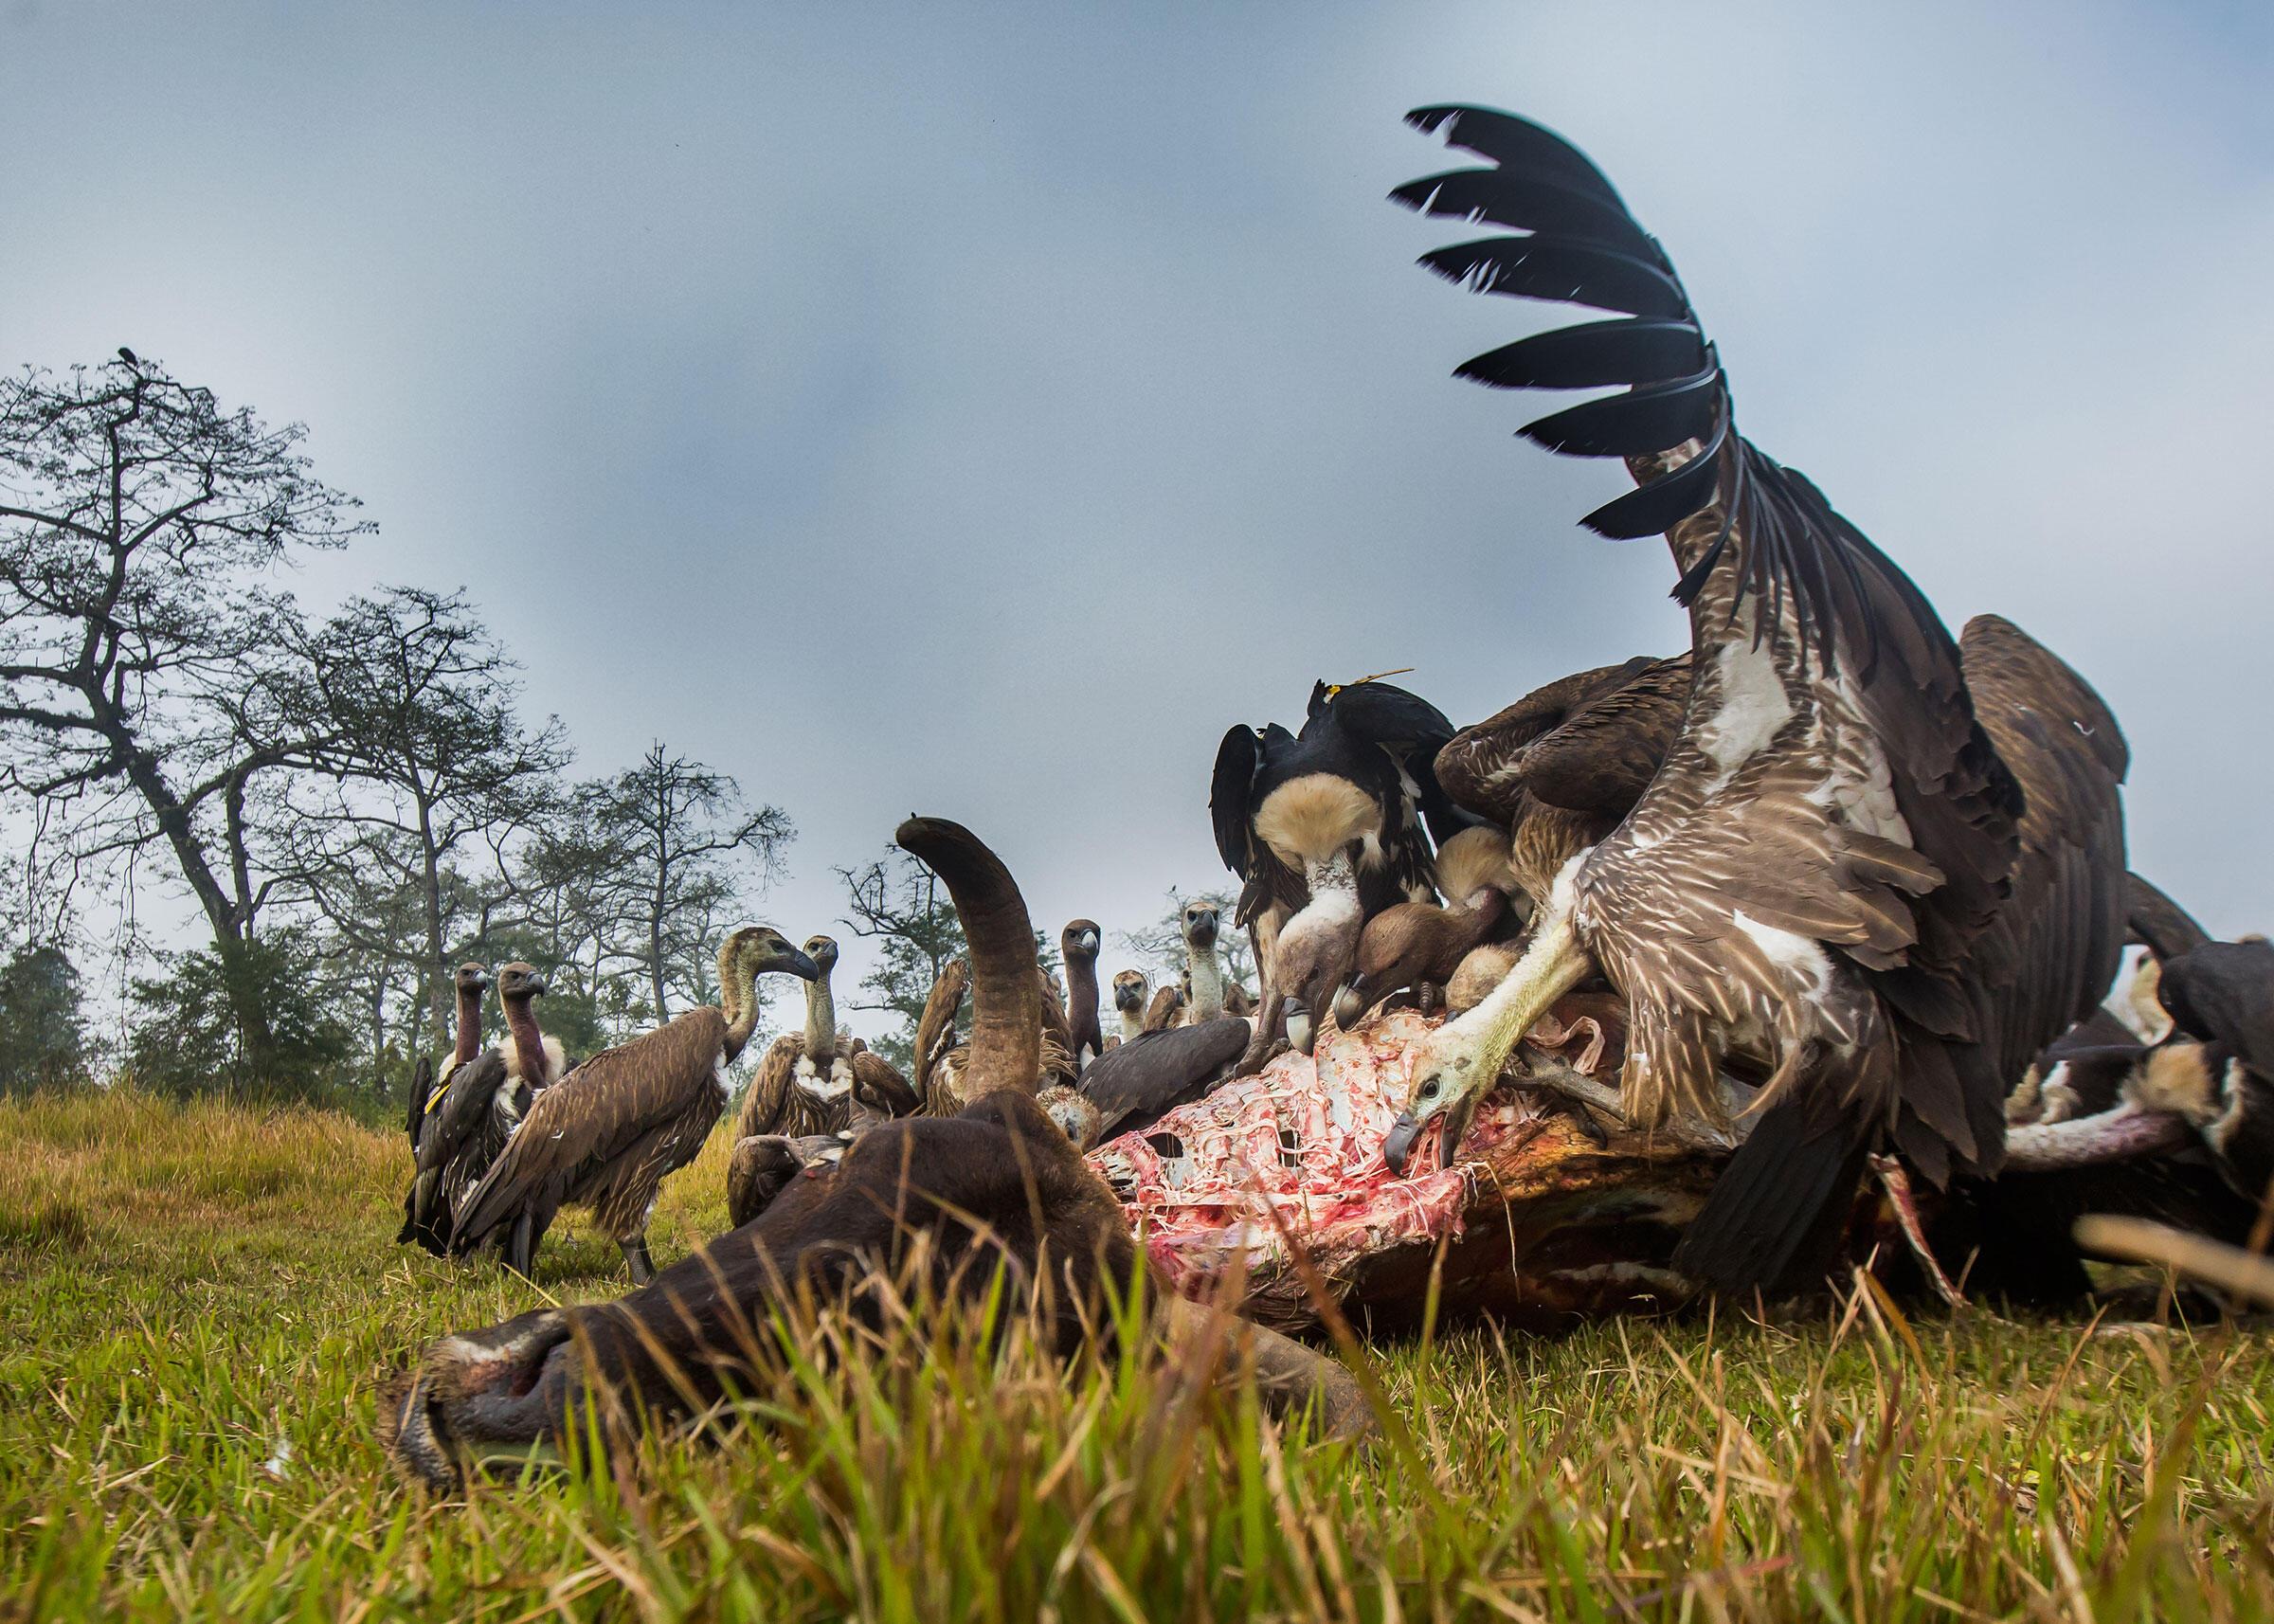 Vultures devour a carcass in Chitwan National Park, Nepal. Paul Hilton